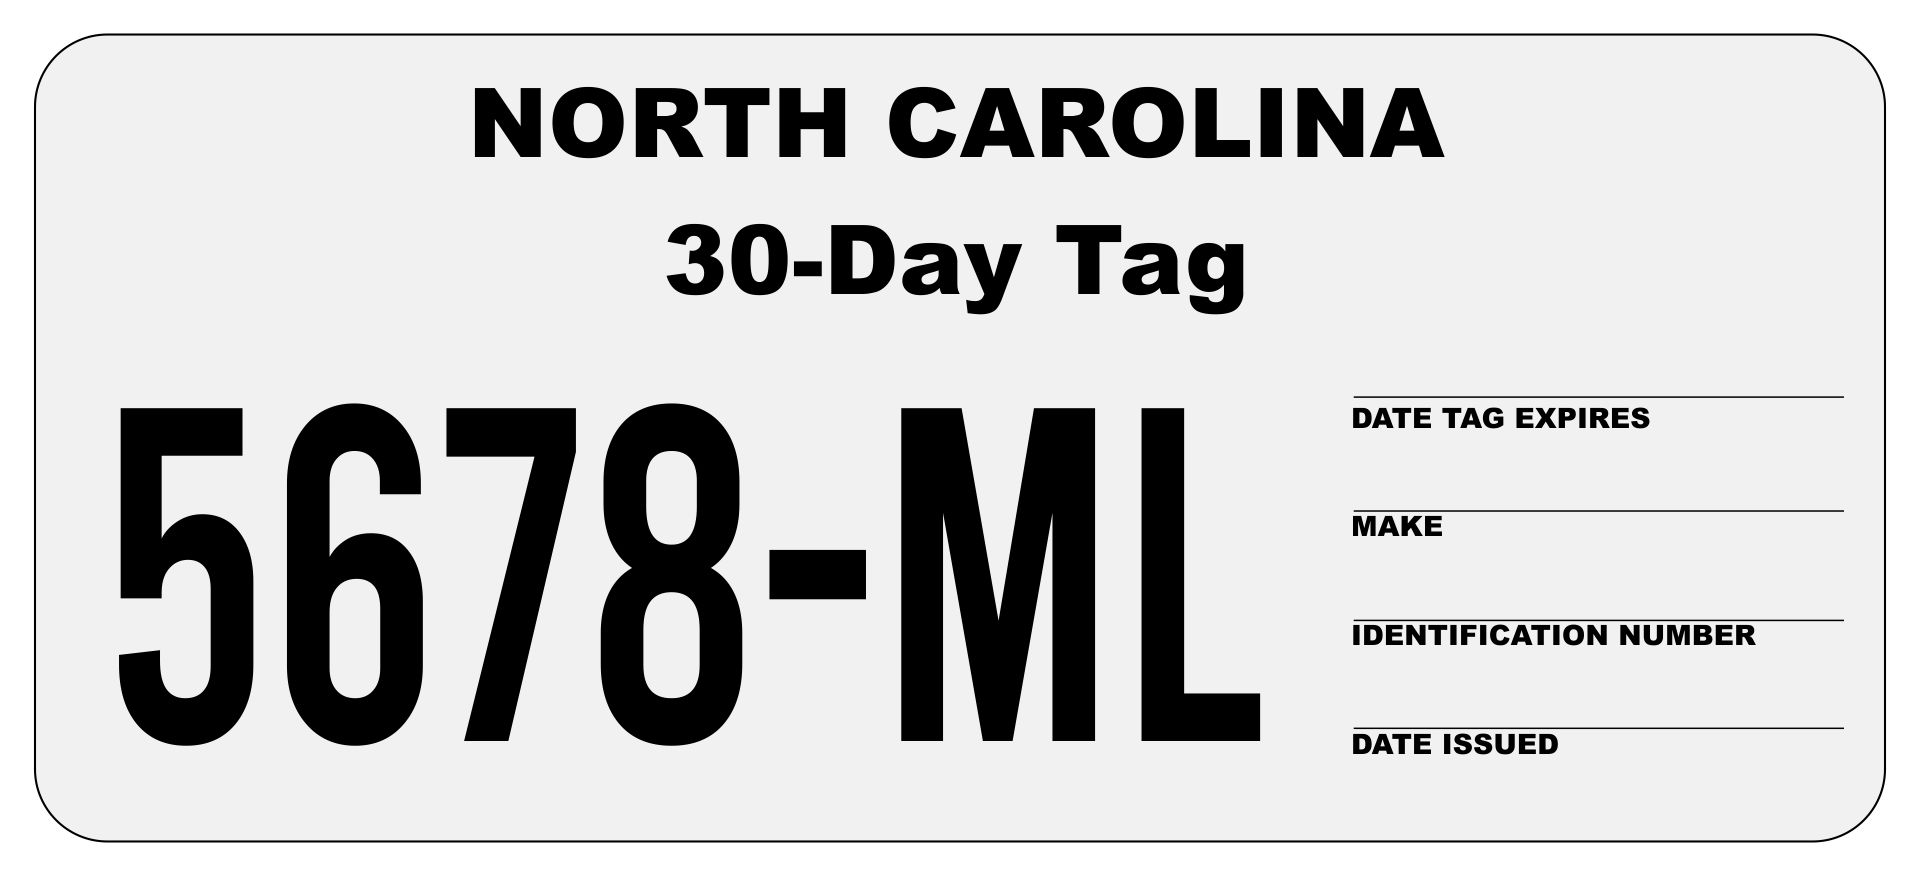 30-Day Temporary Tag North Carolina